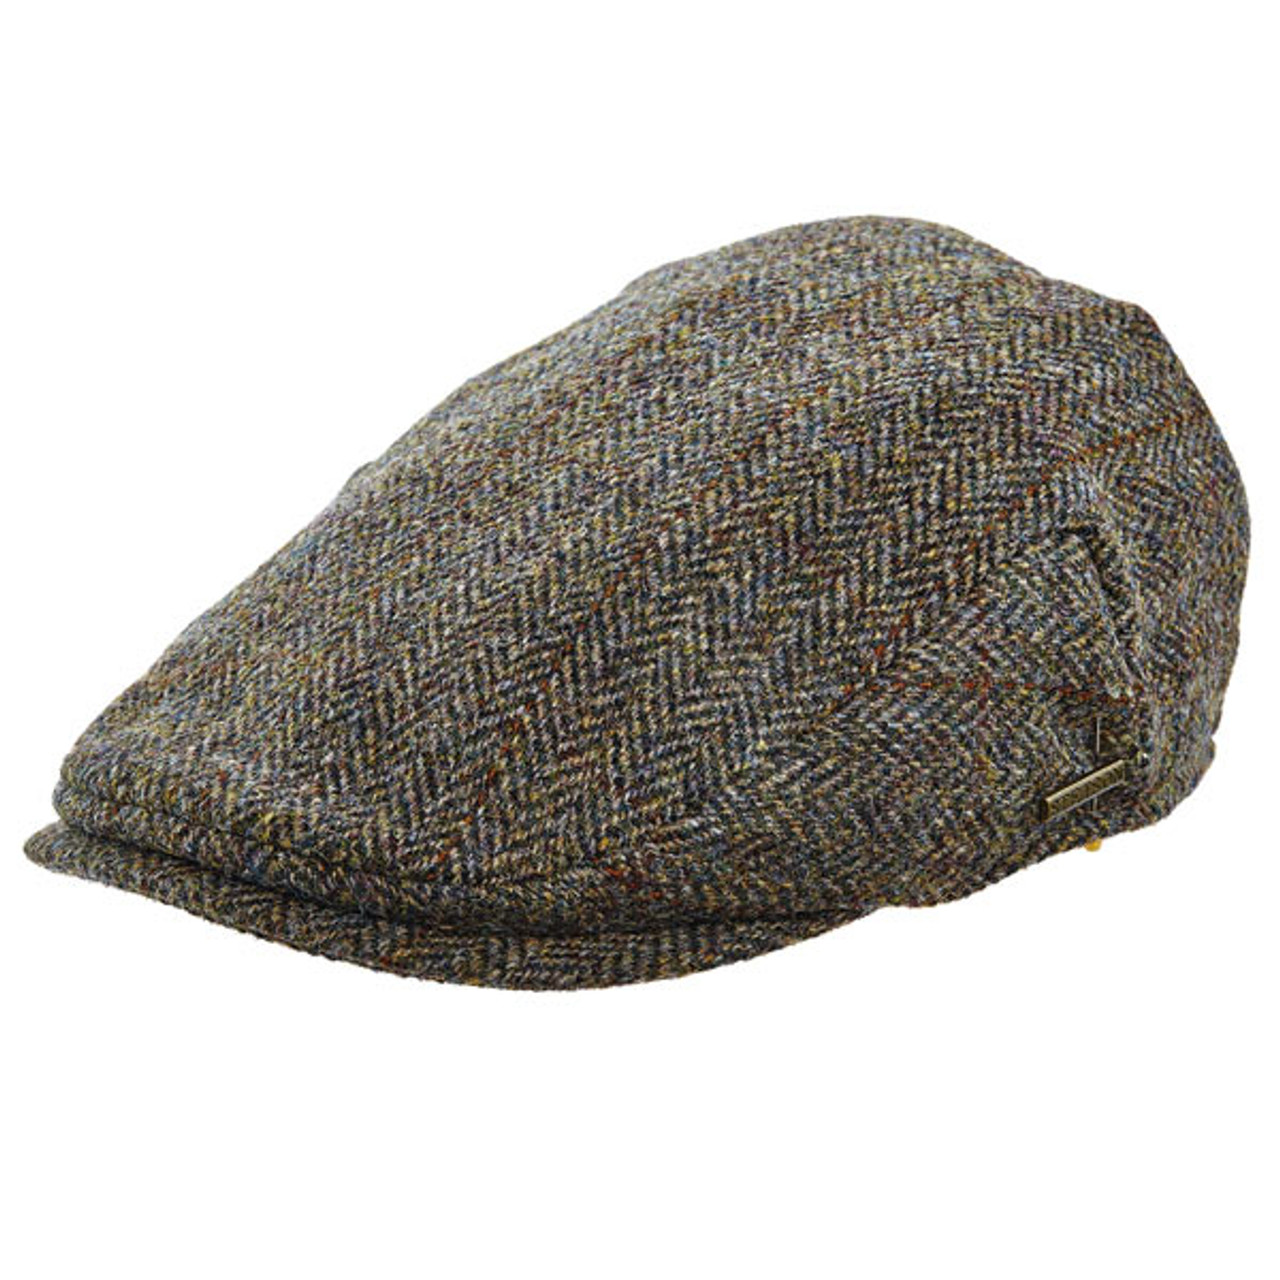 d429e28c7 Stetson - Harris Tweed Ivy Cap